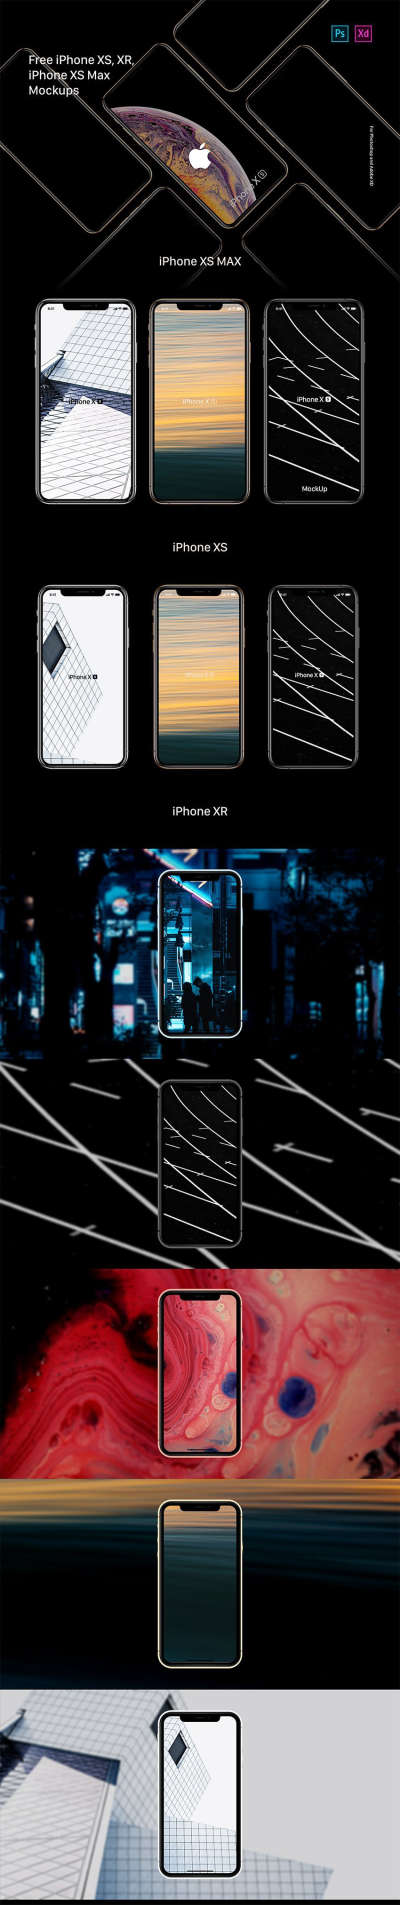 iPhone XR Free Mockup